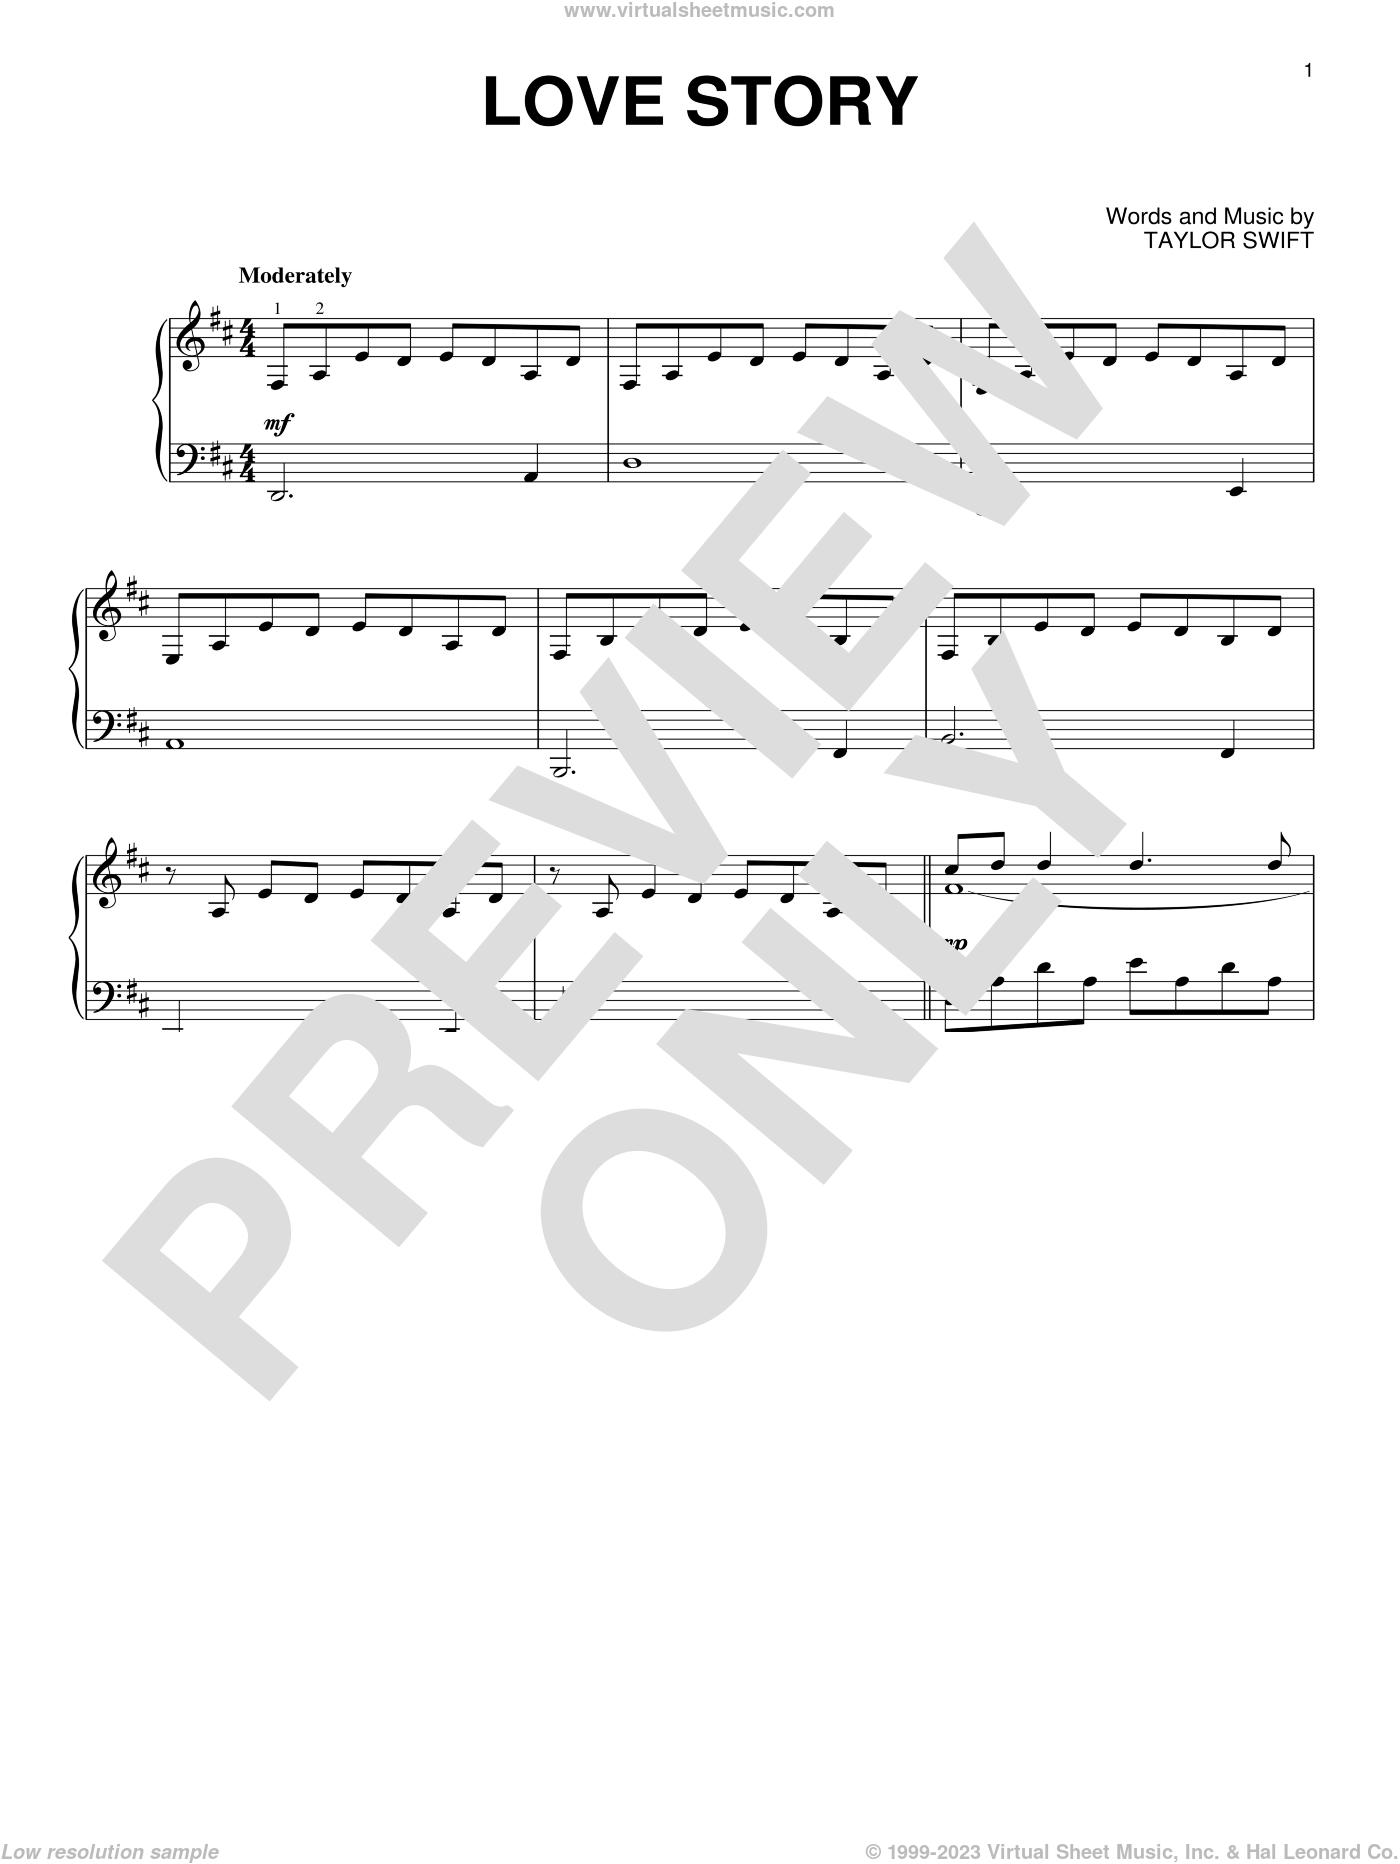 Love Story, (intermediate) sheet music for piano solo by Taylor Swift, intermediate skill level